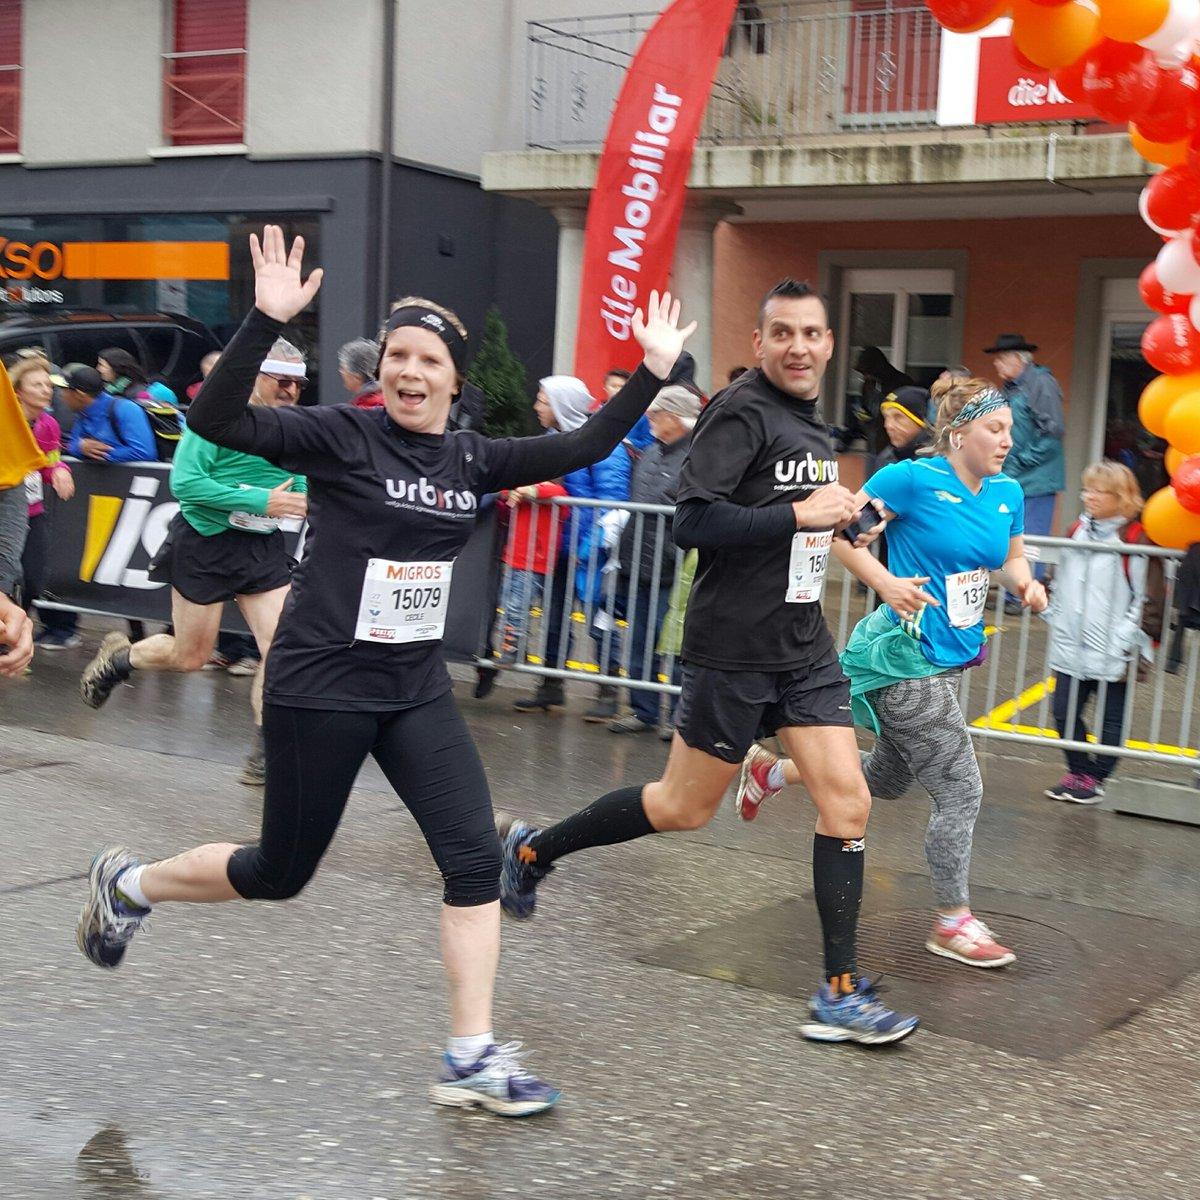 Happy #runner à @kerzerslauf 15K. Run happy with @urbirun #runningtour #sightrunning #courseapied<br>http://pic.twitter.com/VGyq3LOHwU